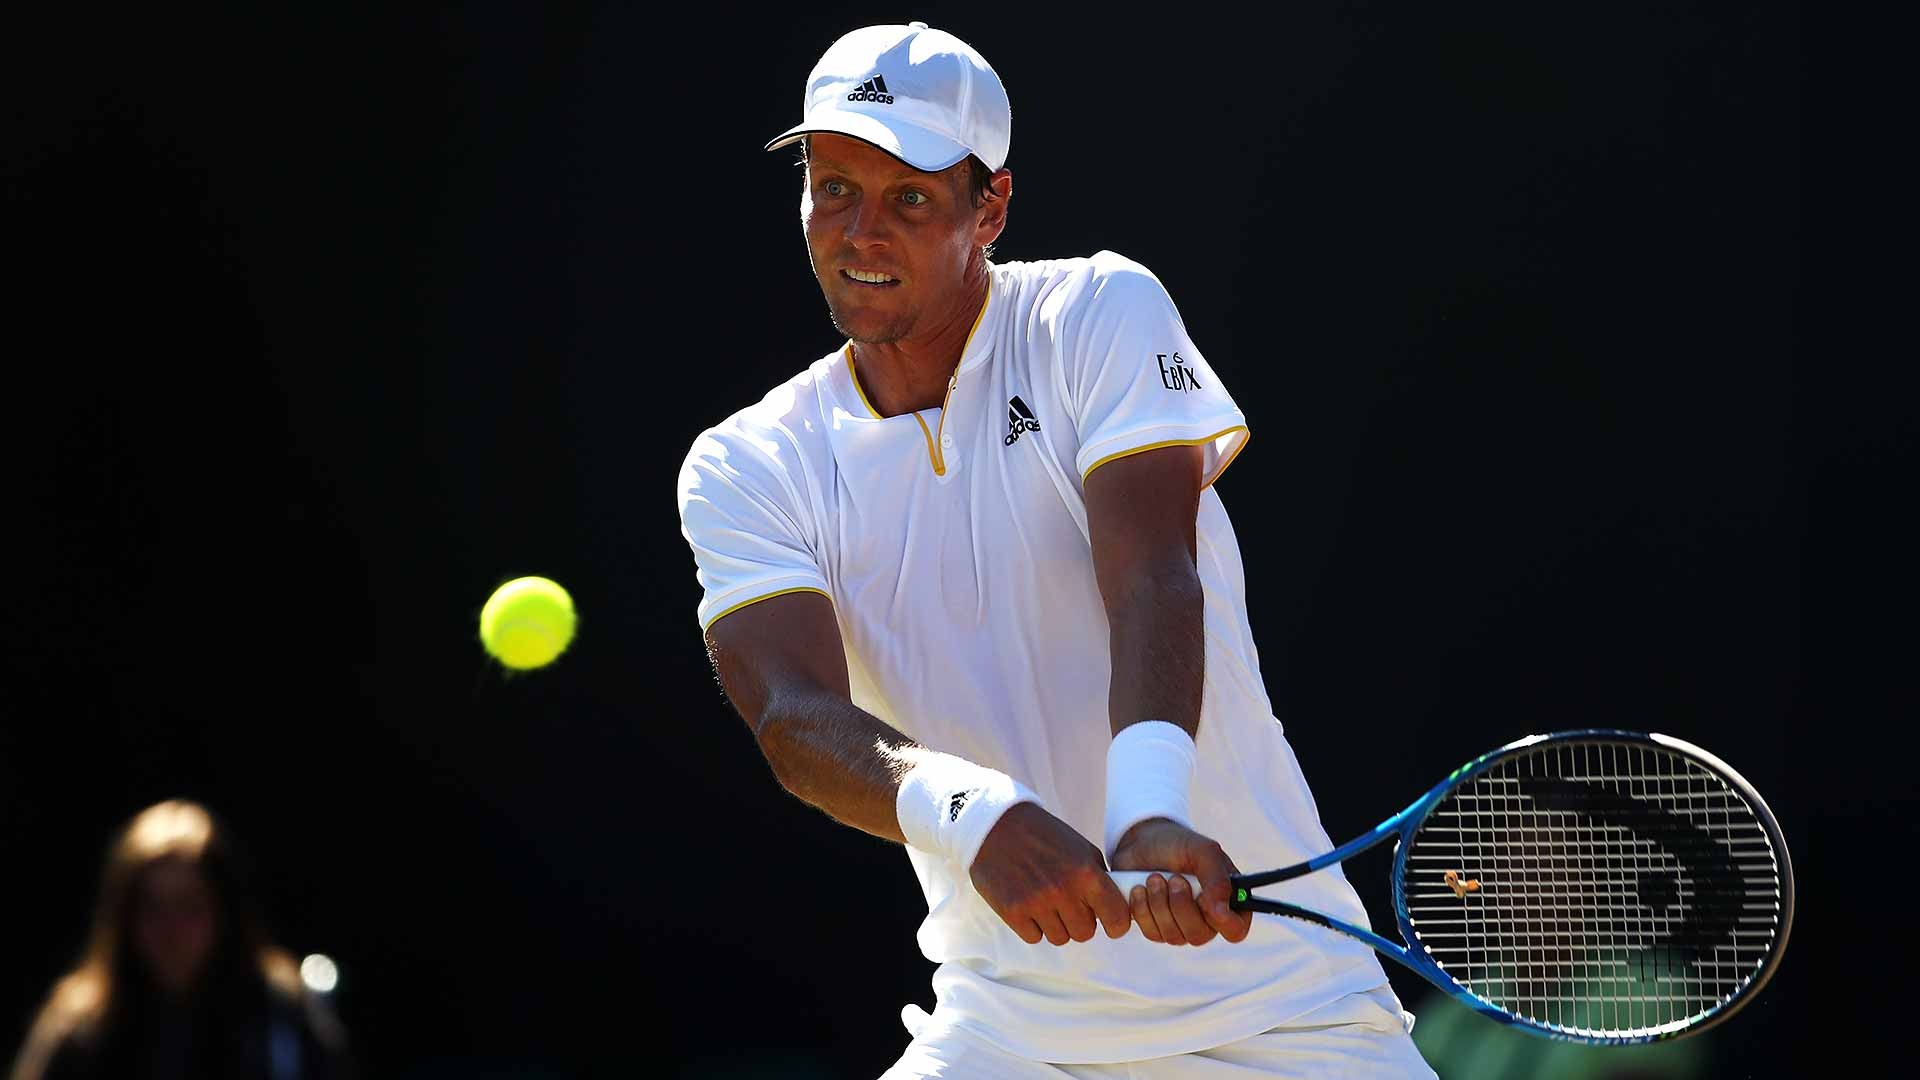 .@tomasberdych d. Ferrer 63 64 63 to return to familiar territory at #Wimbledon. More: https://t.co/7t8OZoRqgr #ATP https://t.co/yZwyDbDuZu